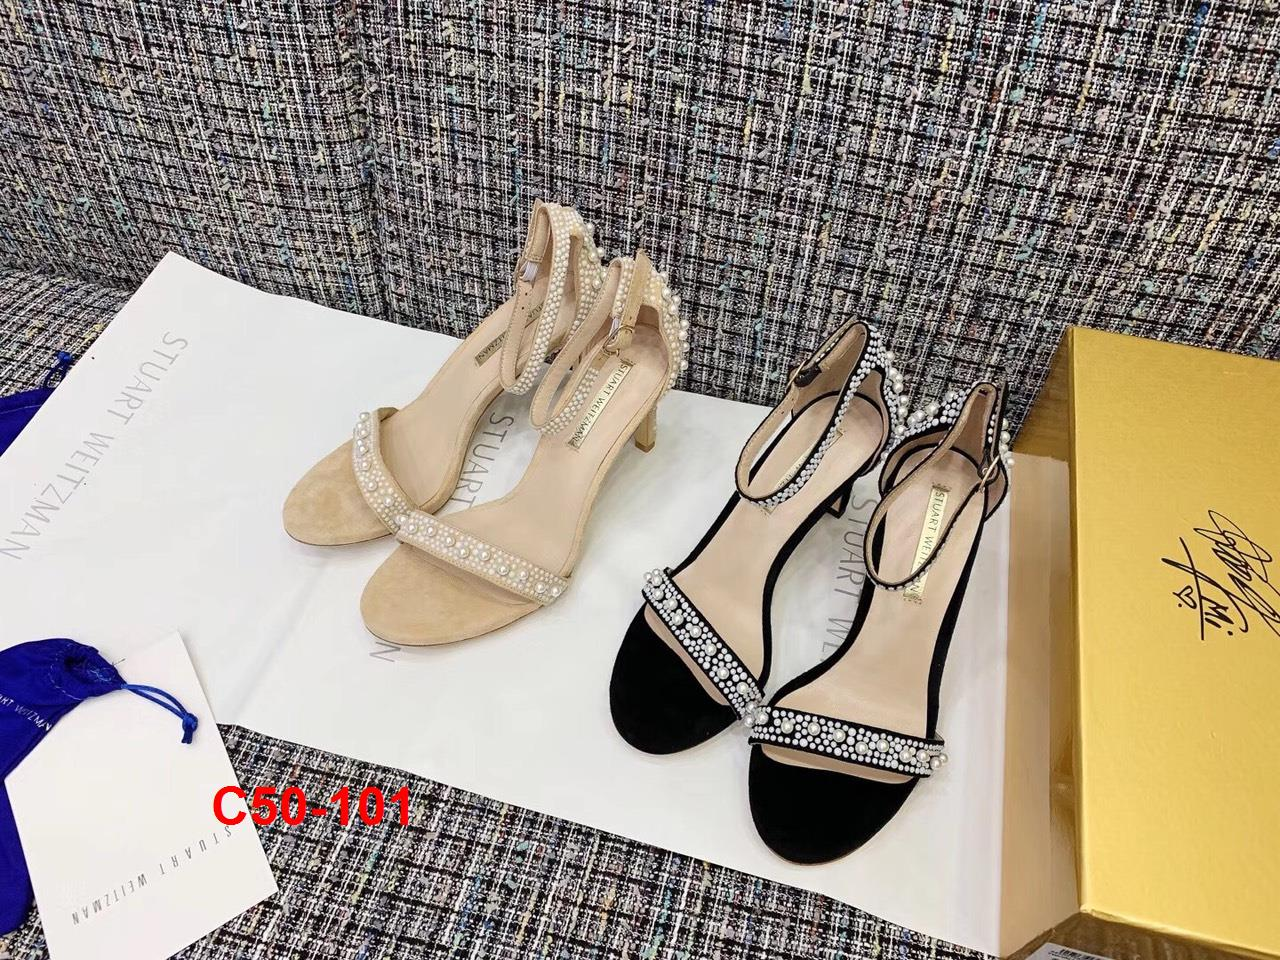 C50-101 Stuart Weitzman sandal cao 9cm siêu cấp